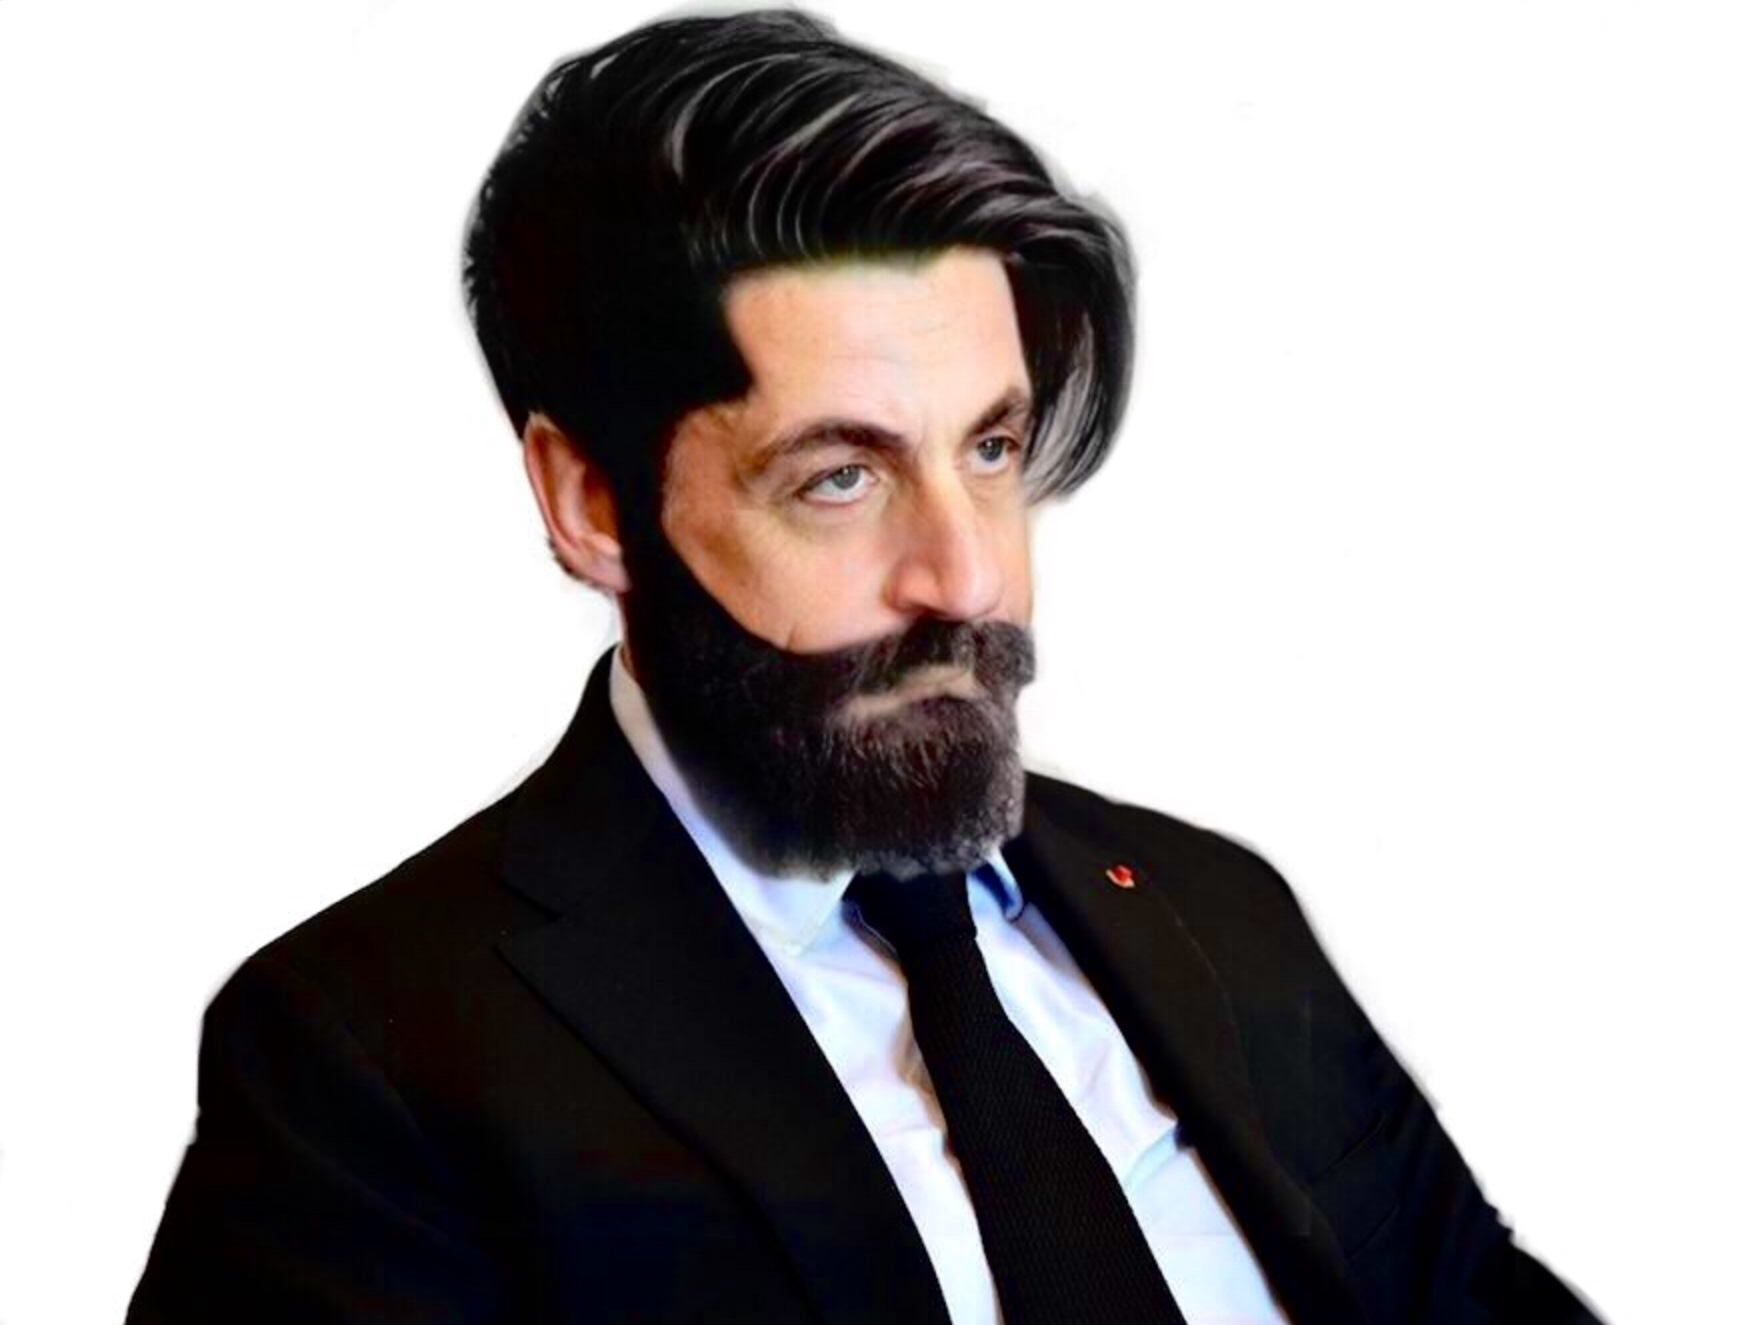 Sticker sarkozy barbe undercut bg alpha beubar minox beau gosse viril seducteur charme minoxidil classe sarko drague